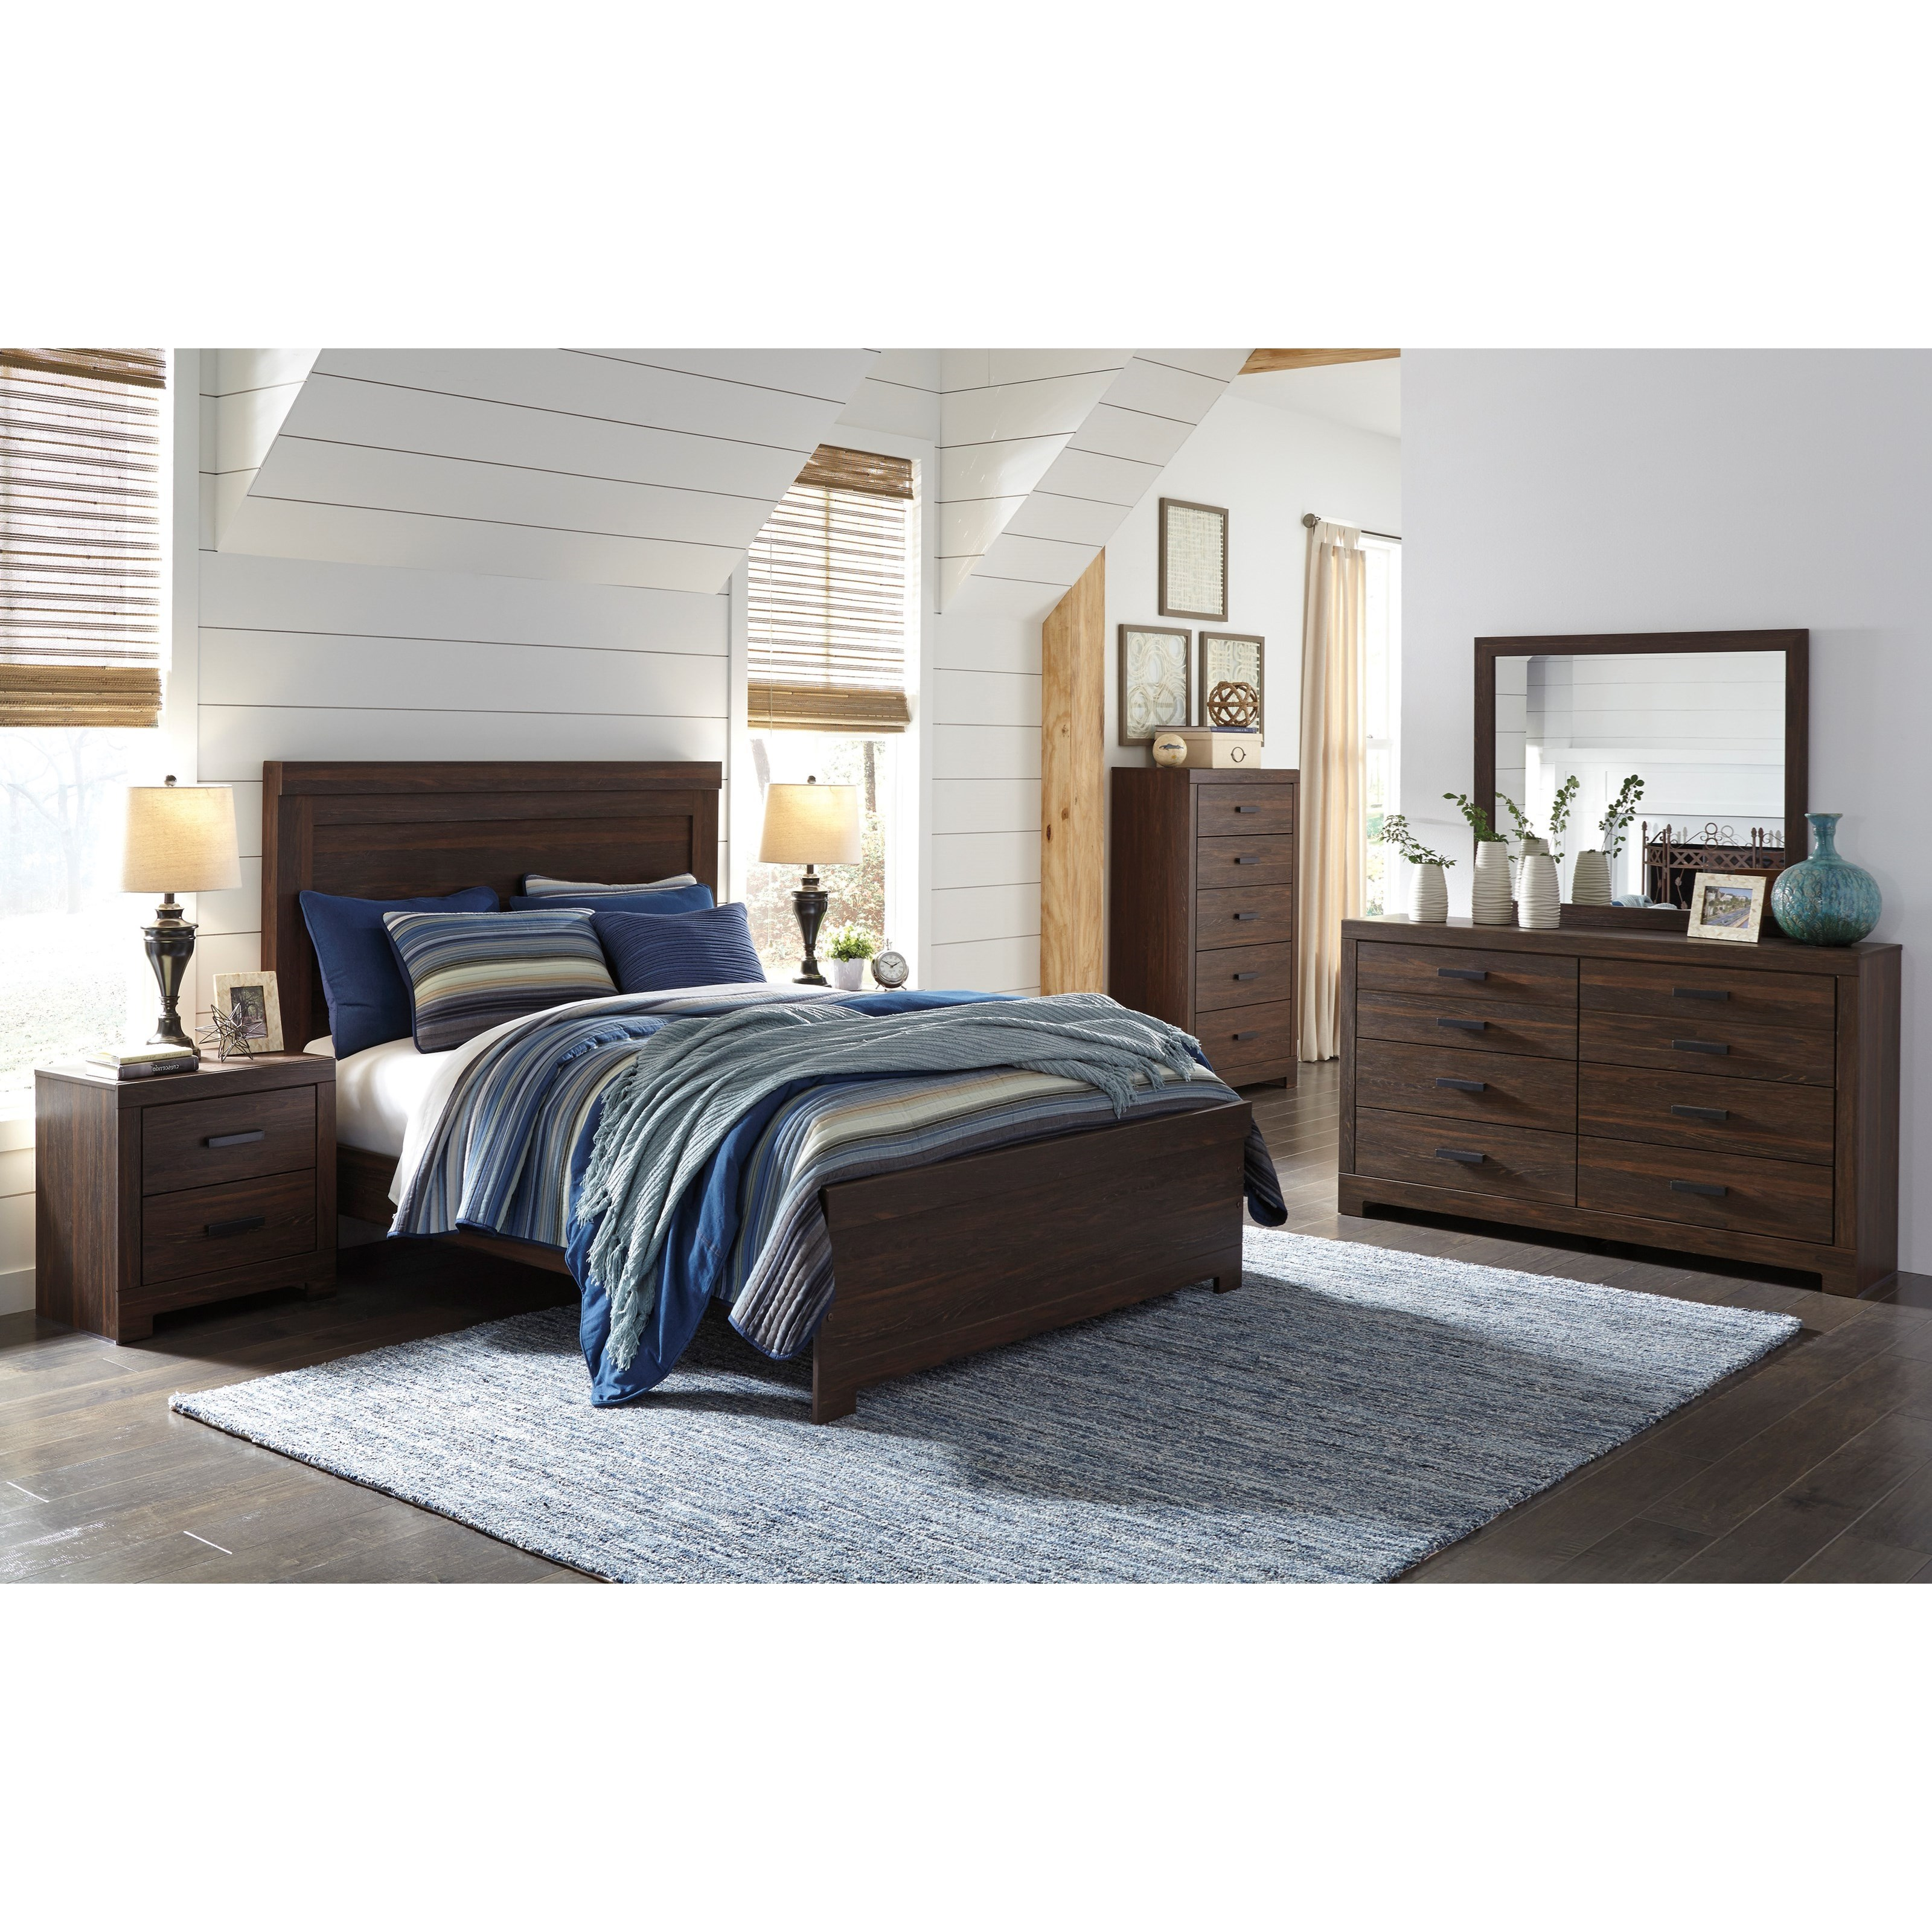 Signature Design By Ashley Arkaline Queen Bedroom Group Olinde 39 S Furnit